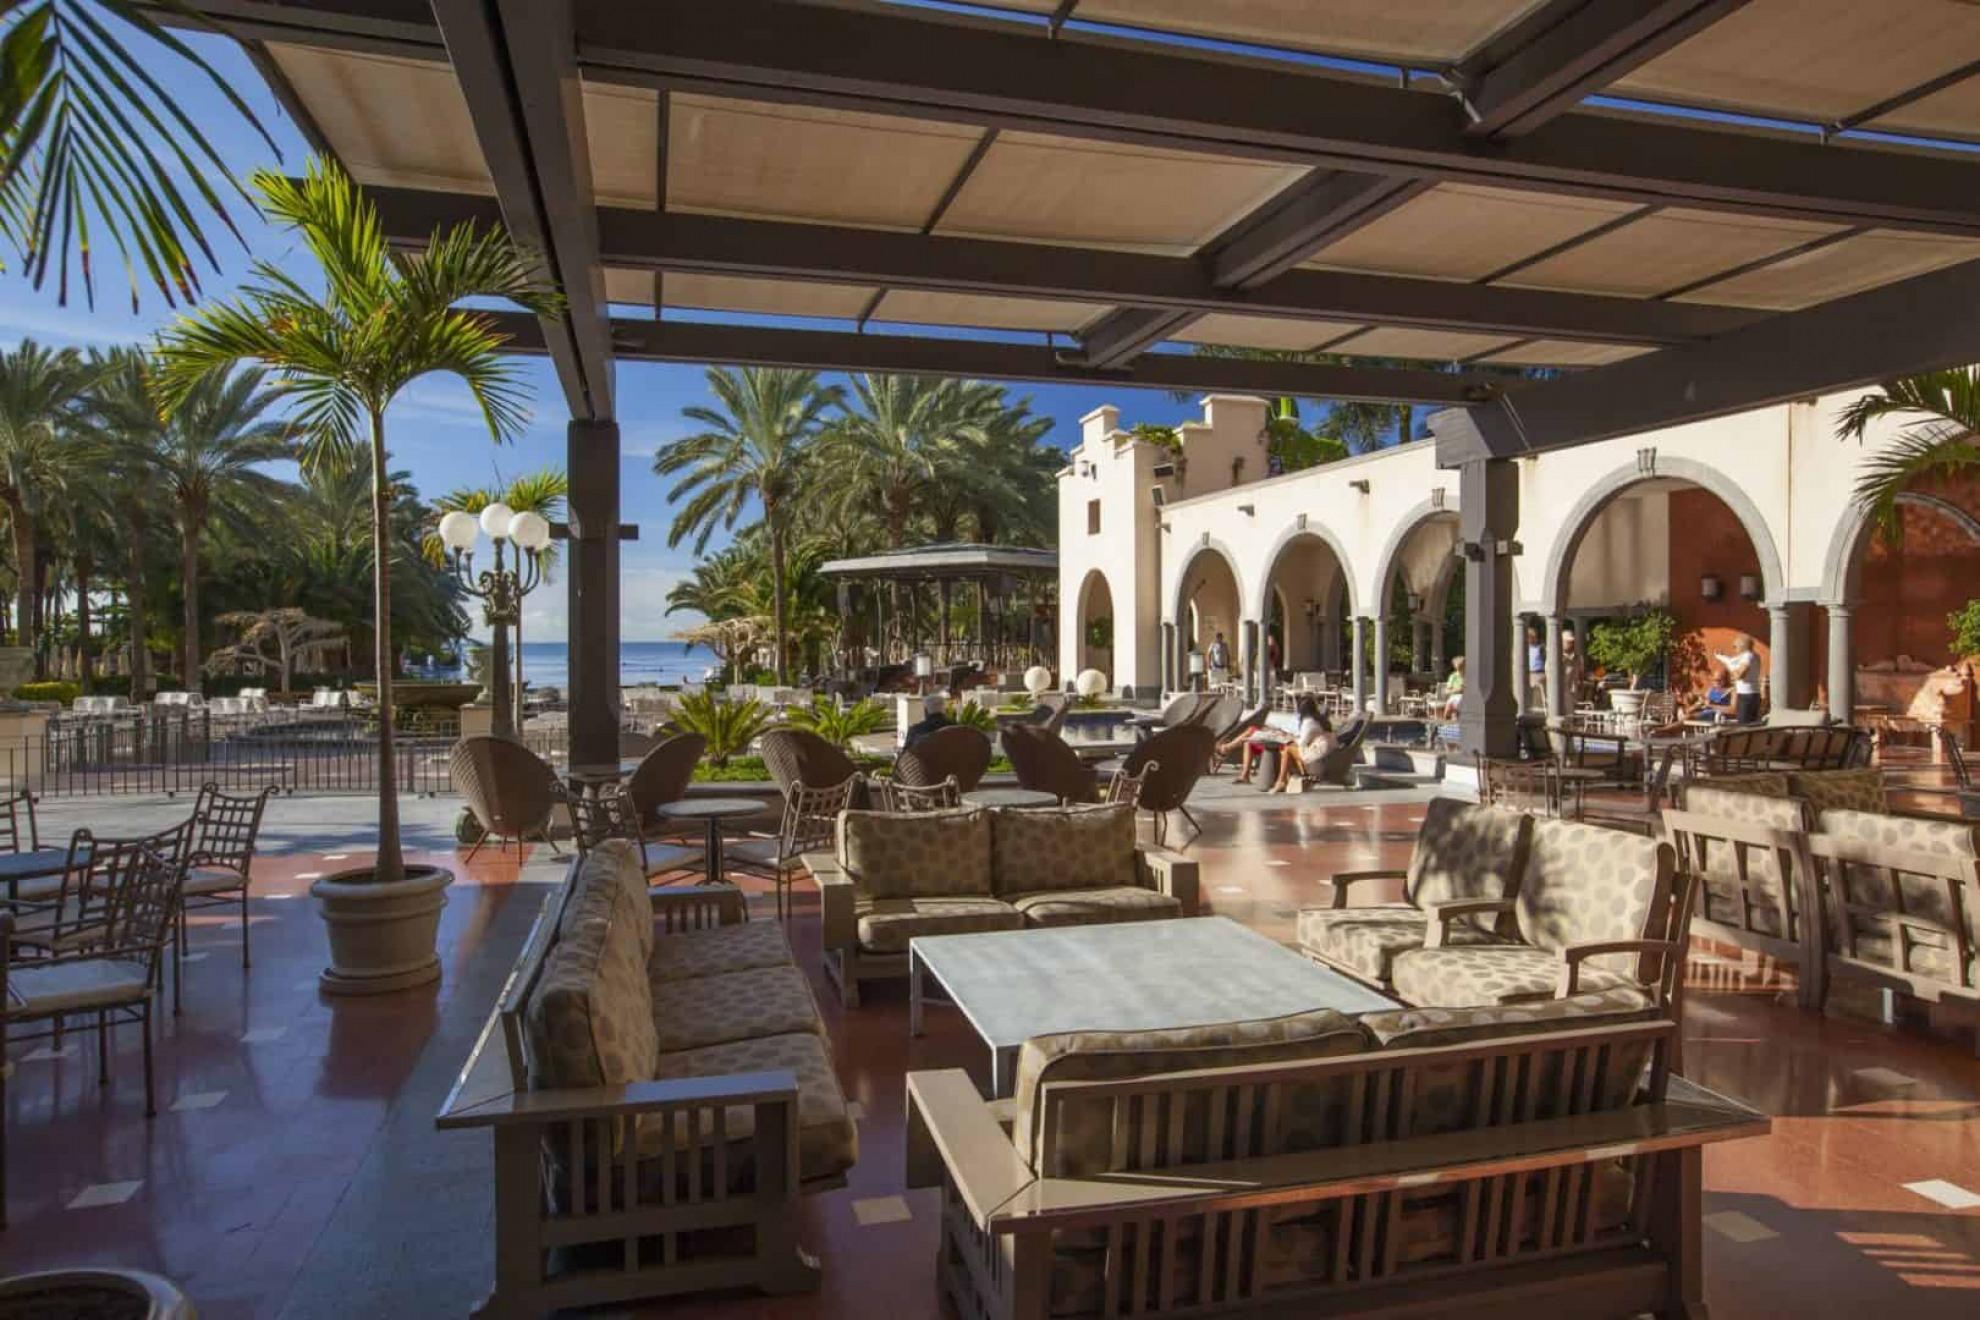 Hotel lopesan costa meloneras resort green golf for Moderne hotels kanaren